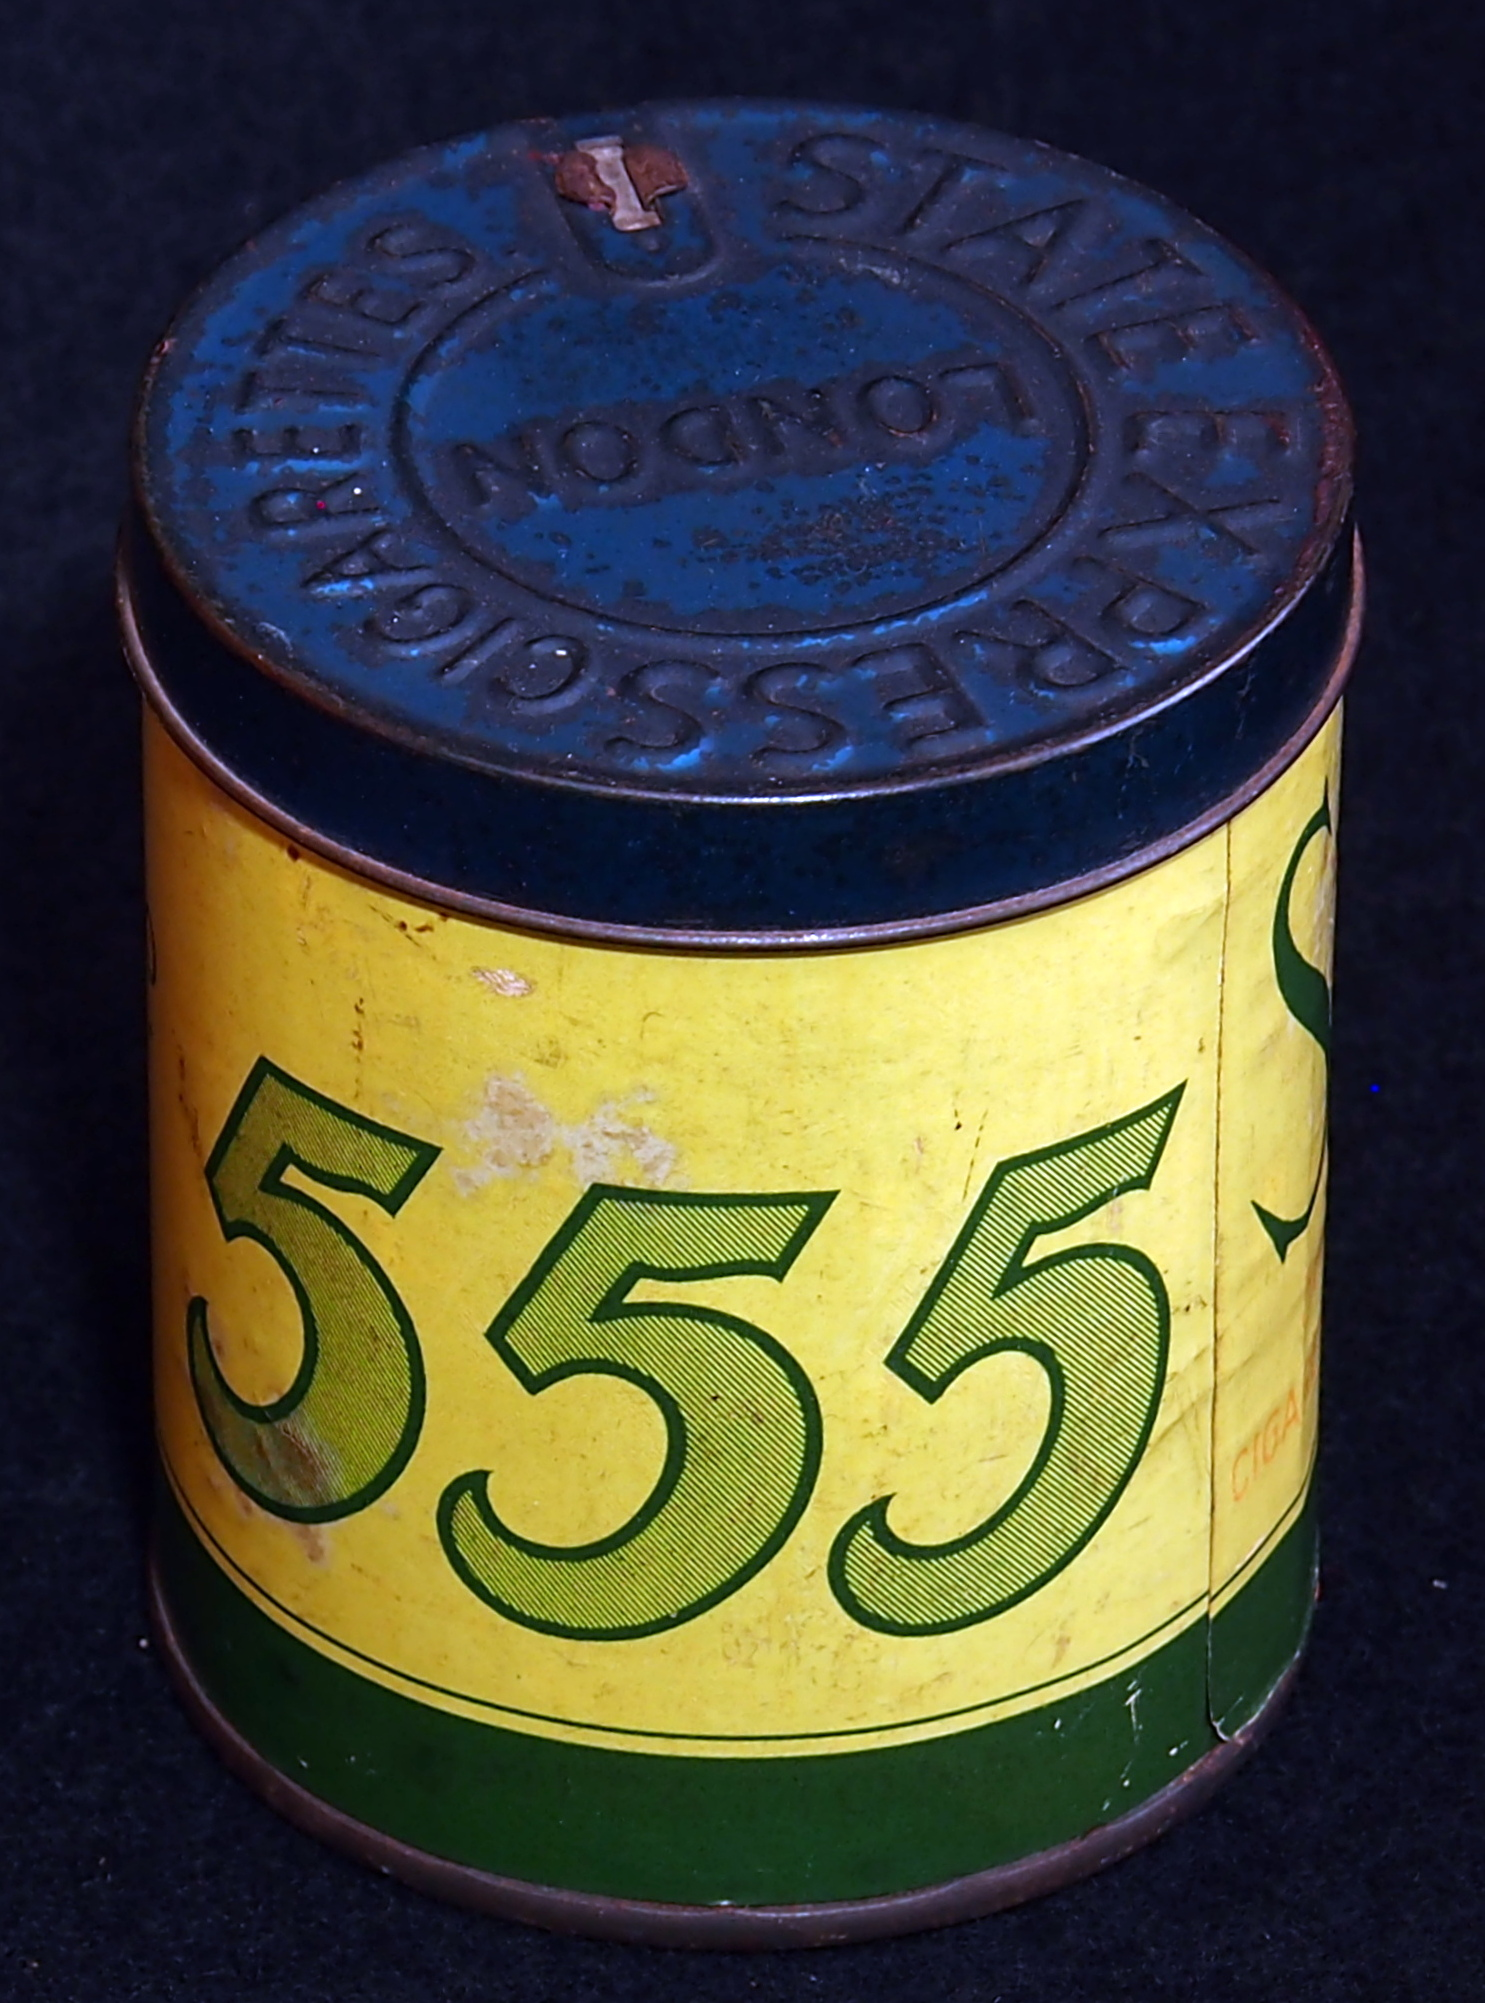 FileState Express Cigarettes No 555 Tin Photo01JPG